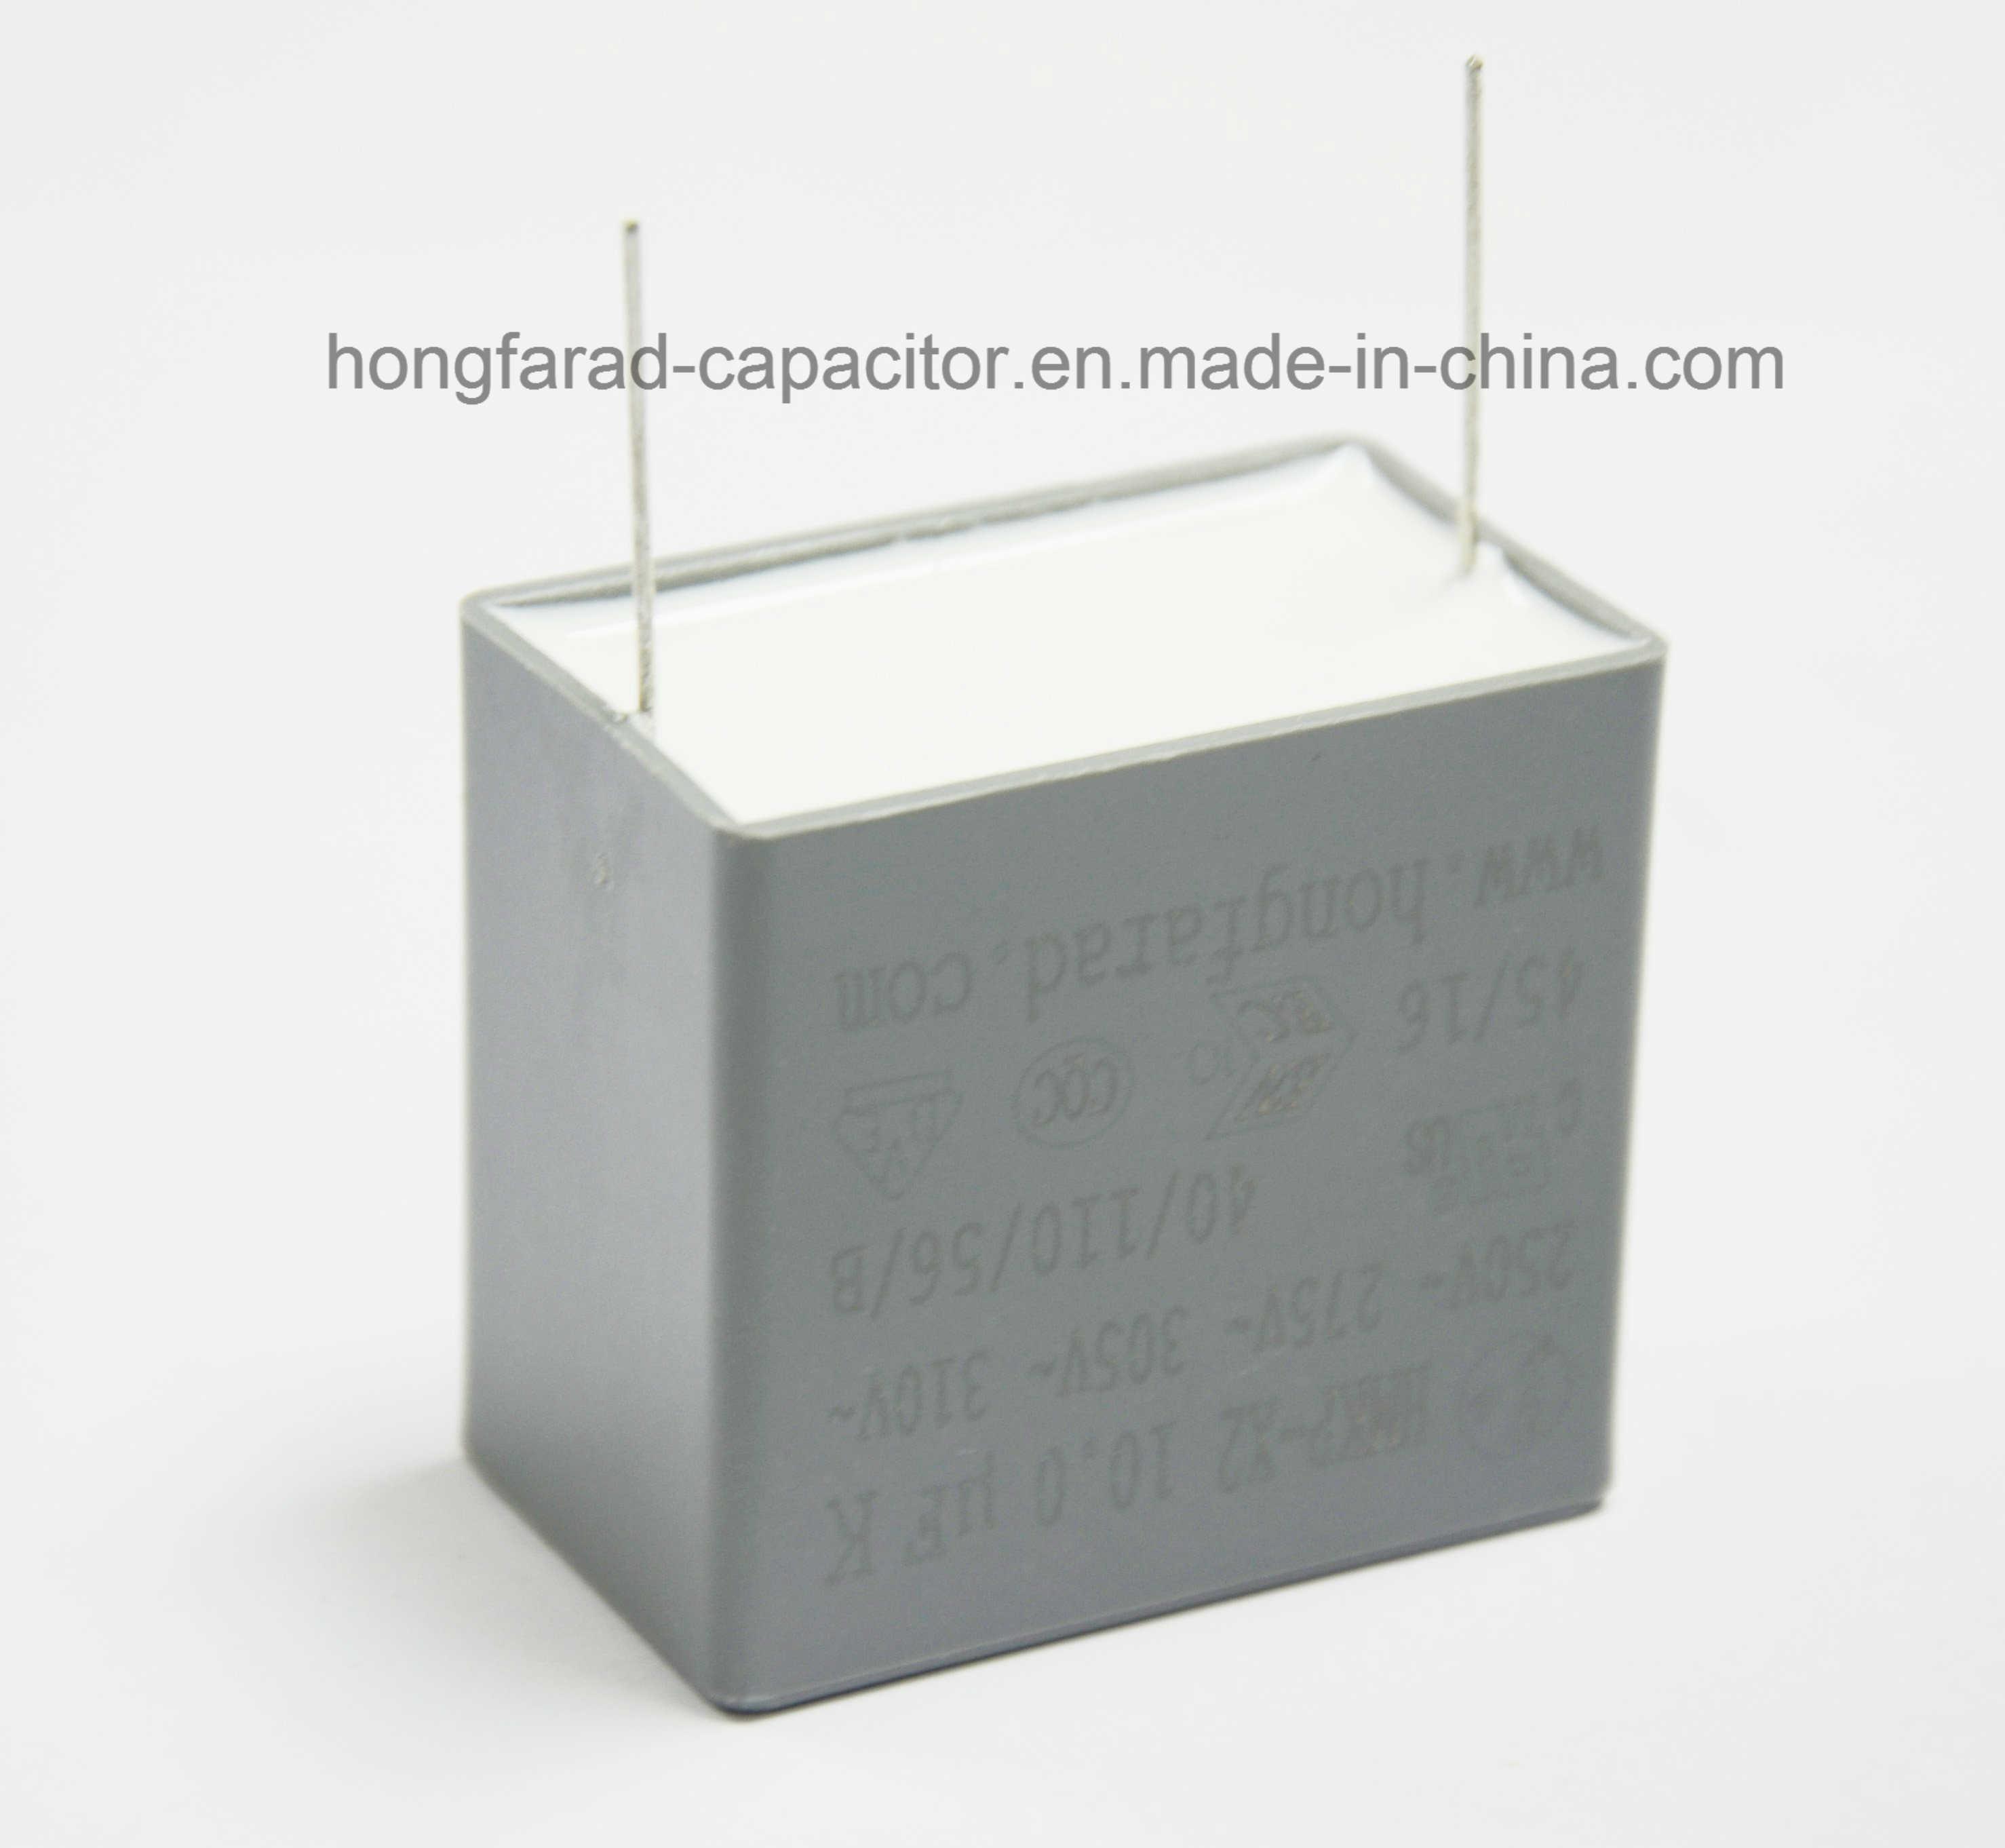 Cbb62 MKP X2 Film Capacitor for White Appliance.